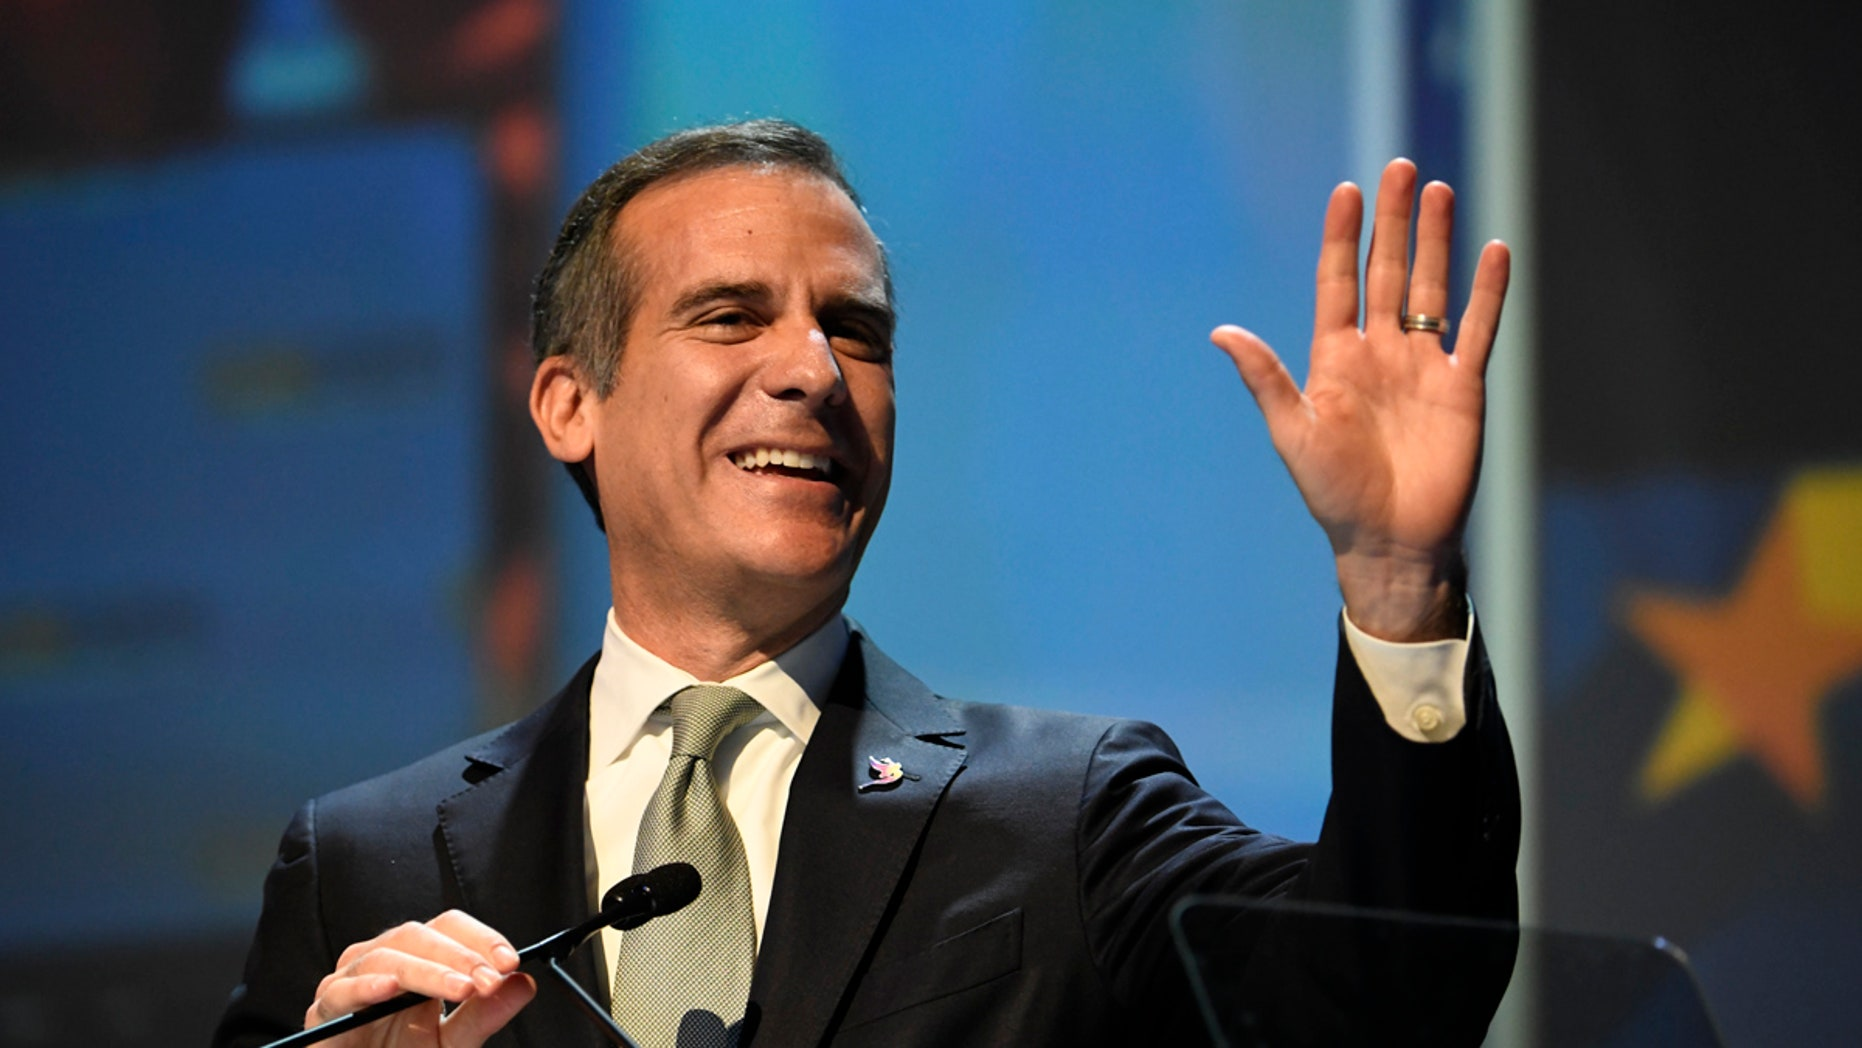 Los Angeles Mayor Eric Garcetti returned Ed Buck's donation in November of last year.